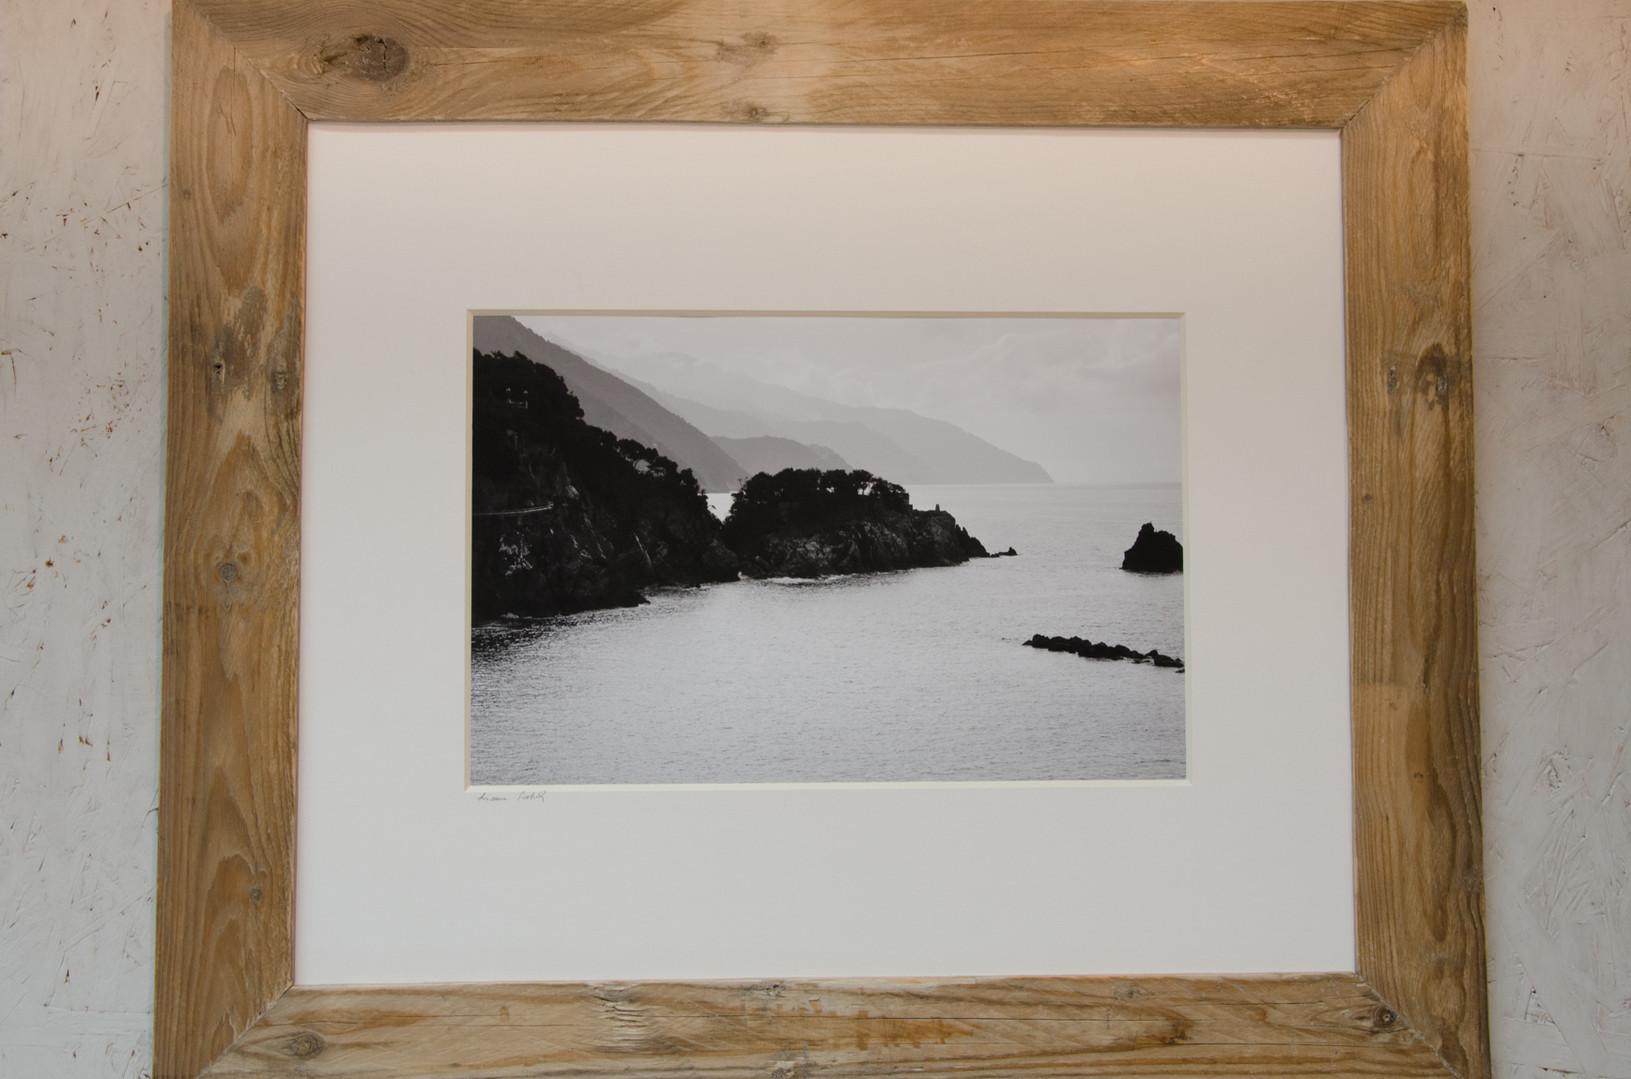 15 Seaside - Susanne Paetsch photo